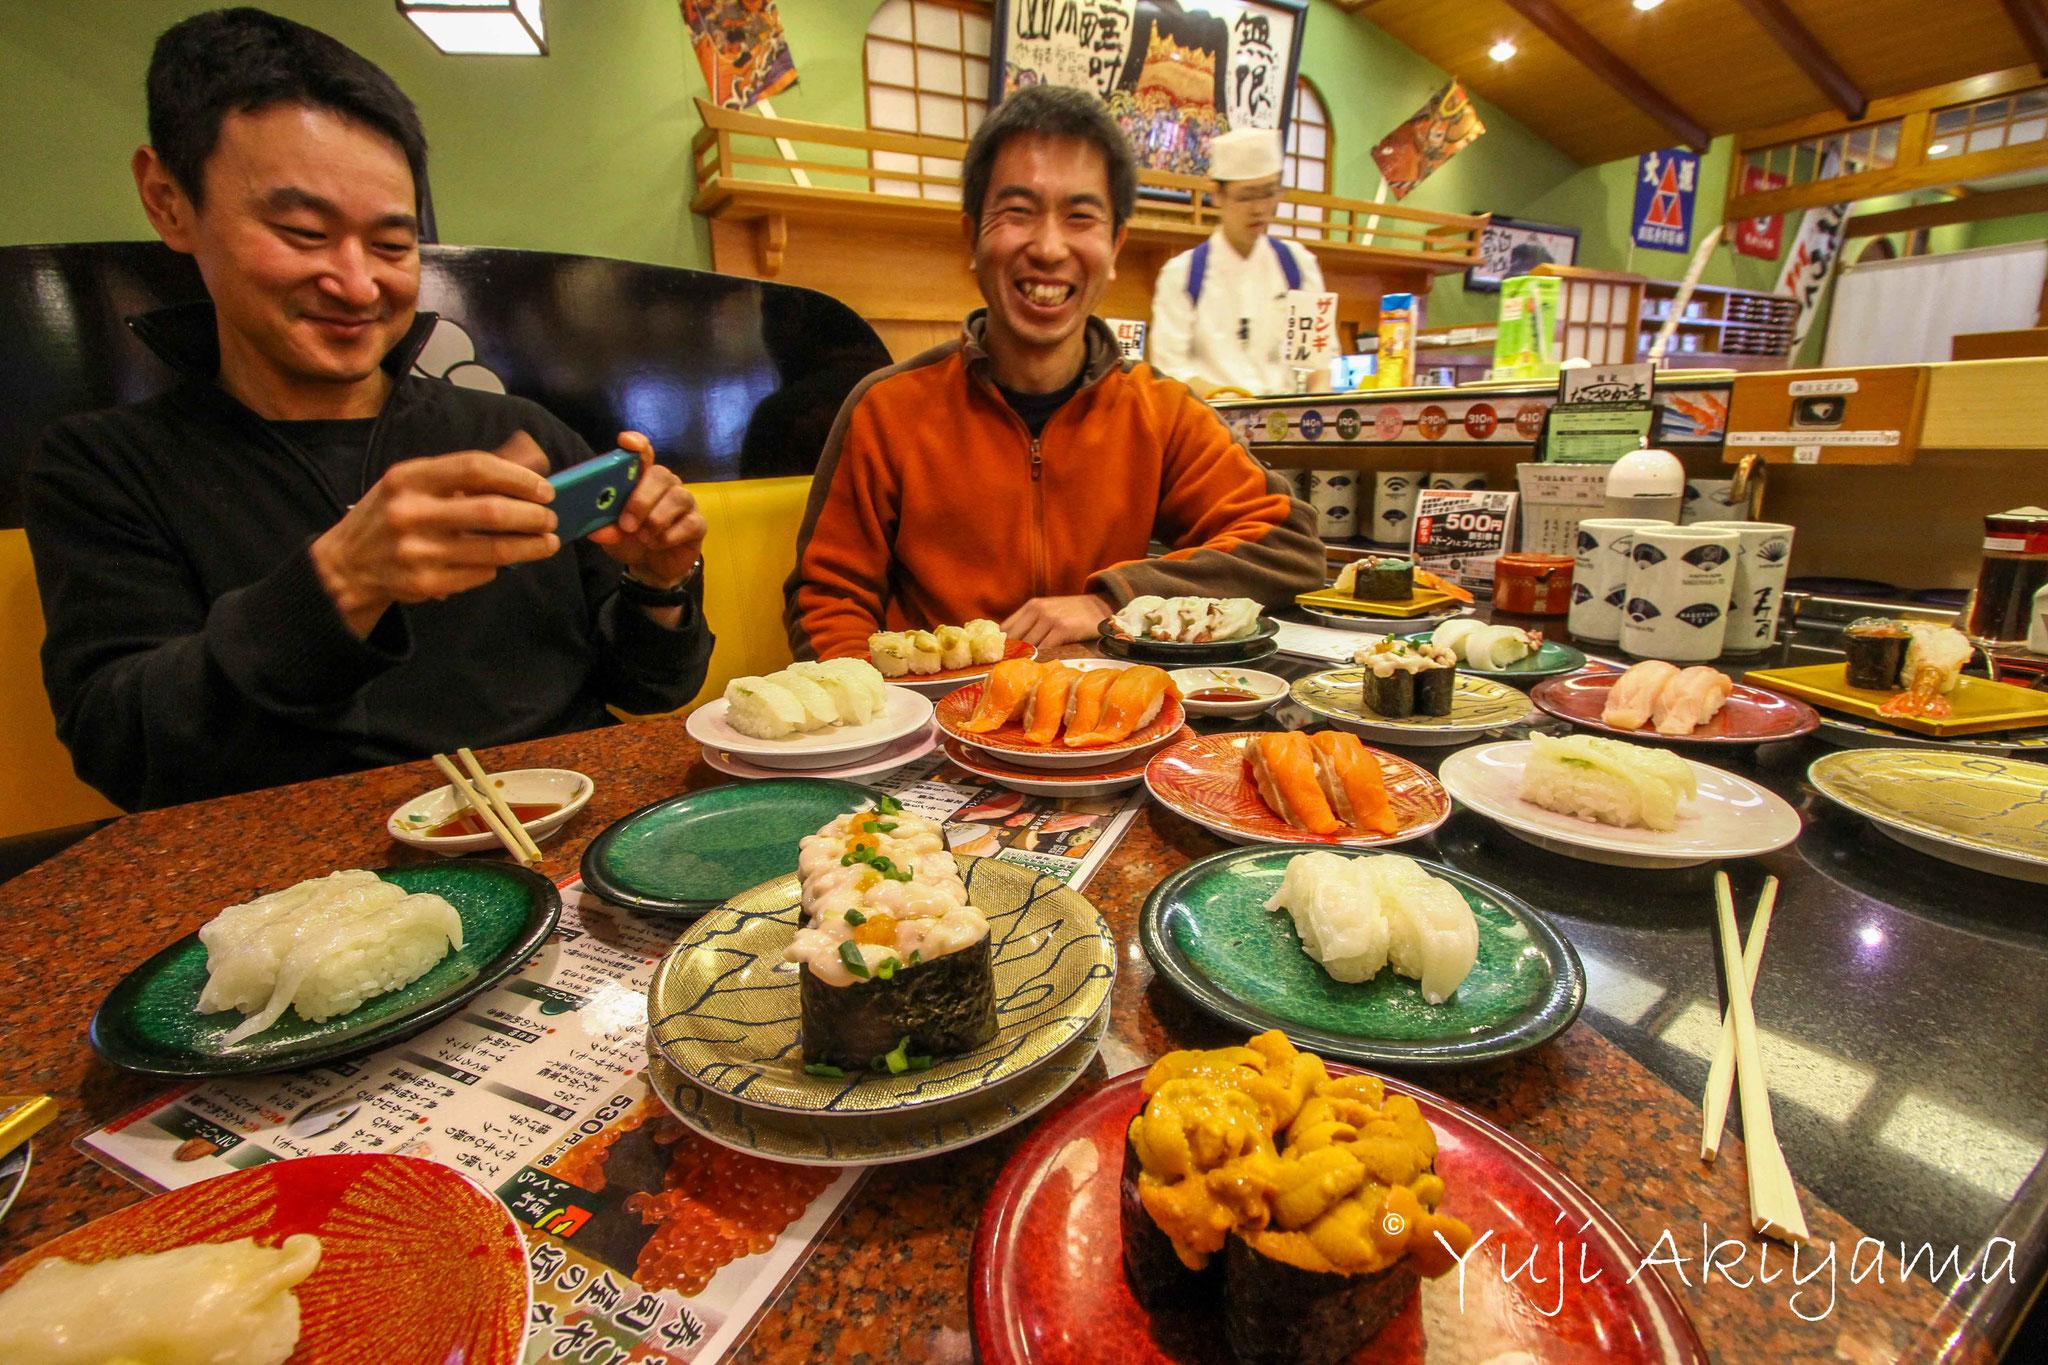 Sushi is famous in Hokkaido